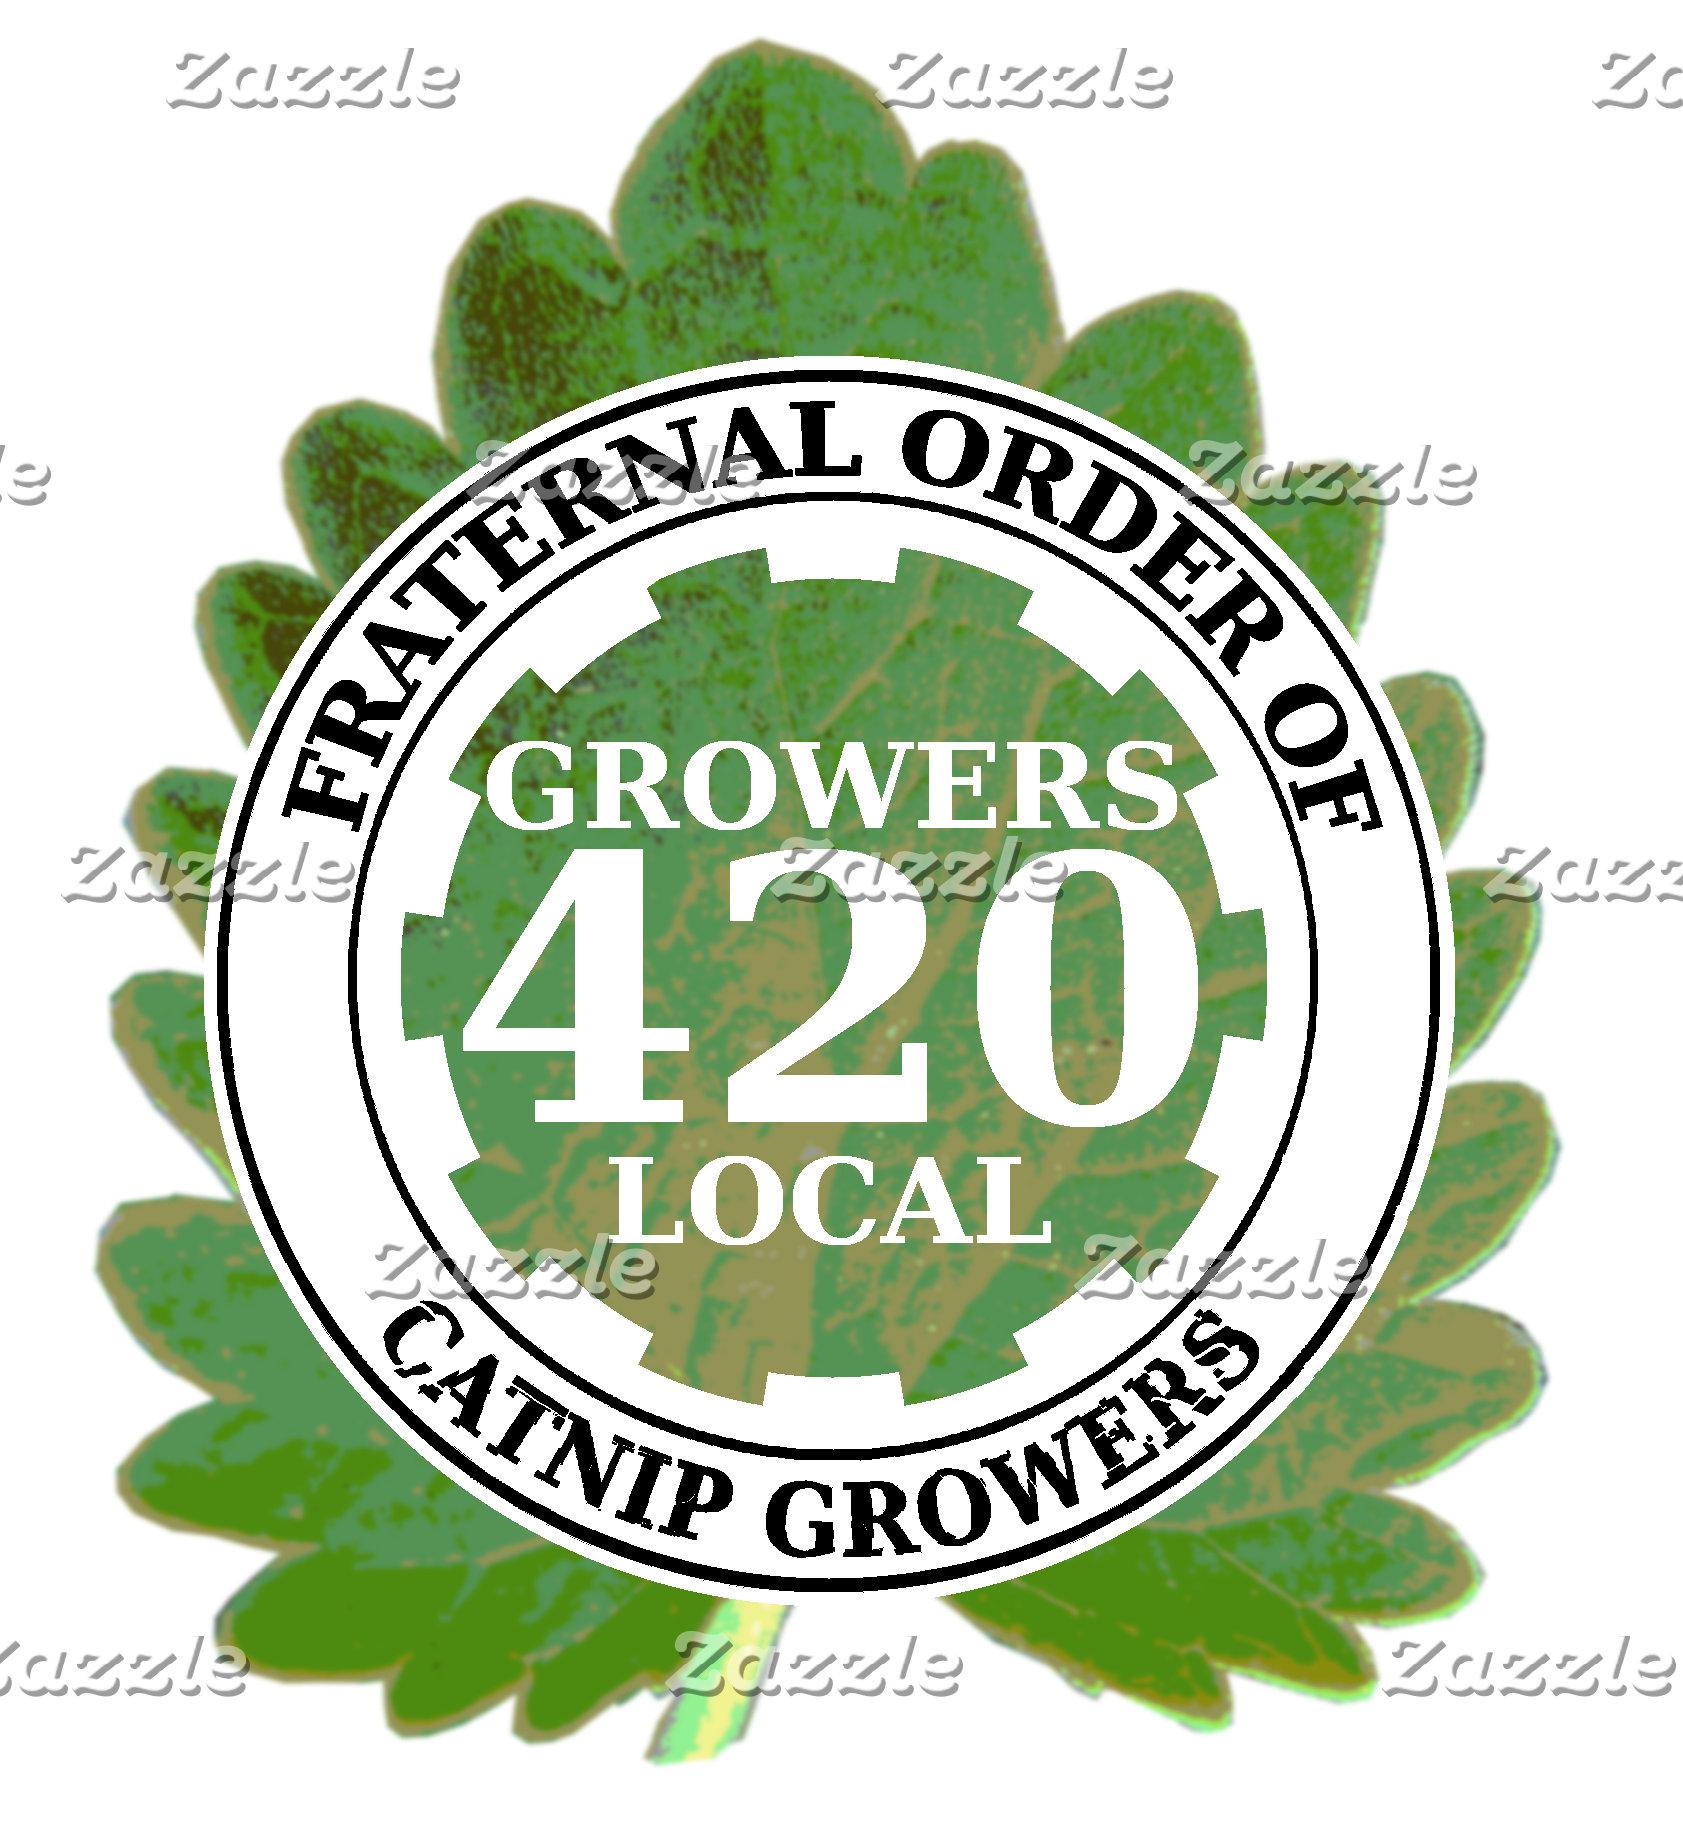 Catnip Growers